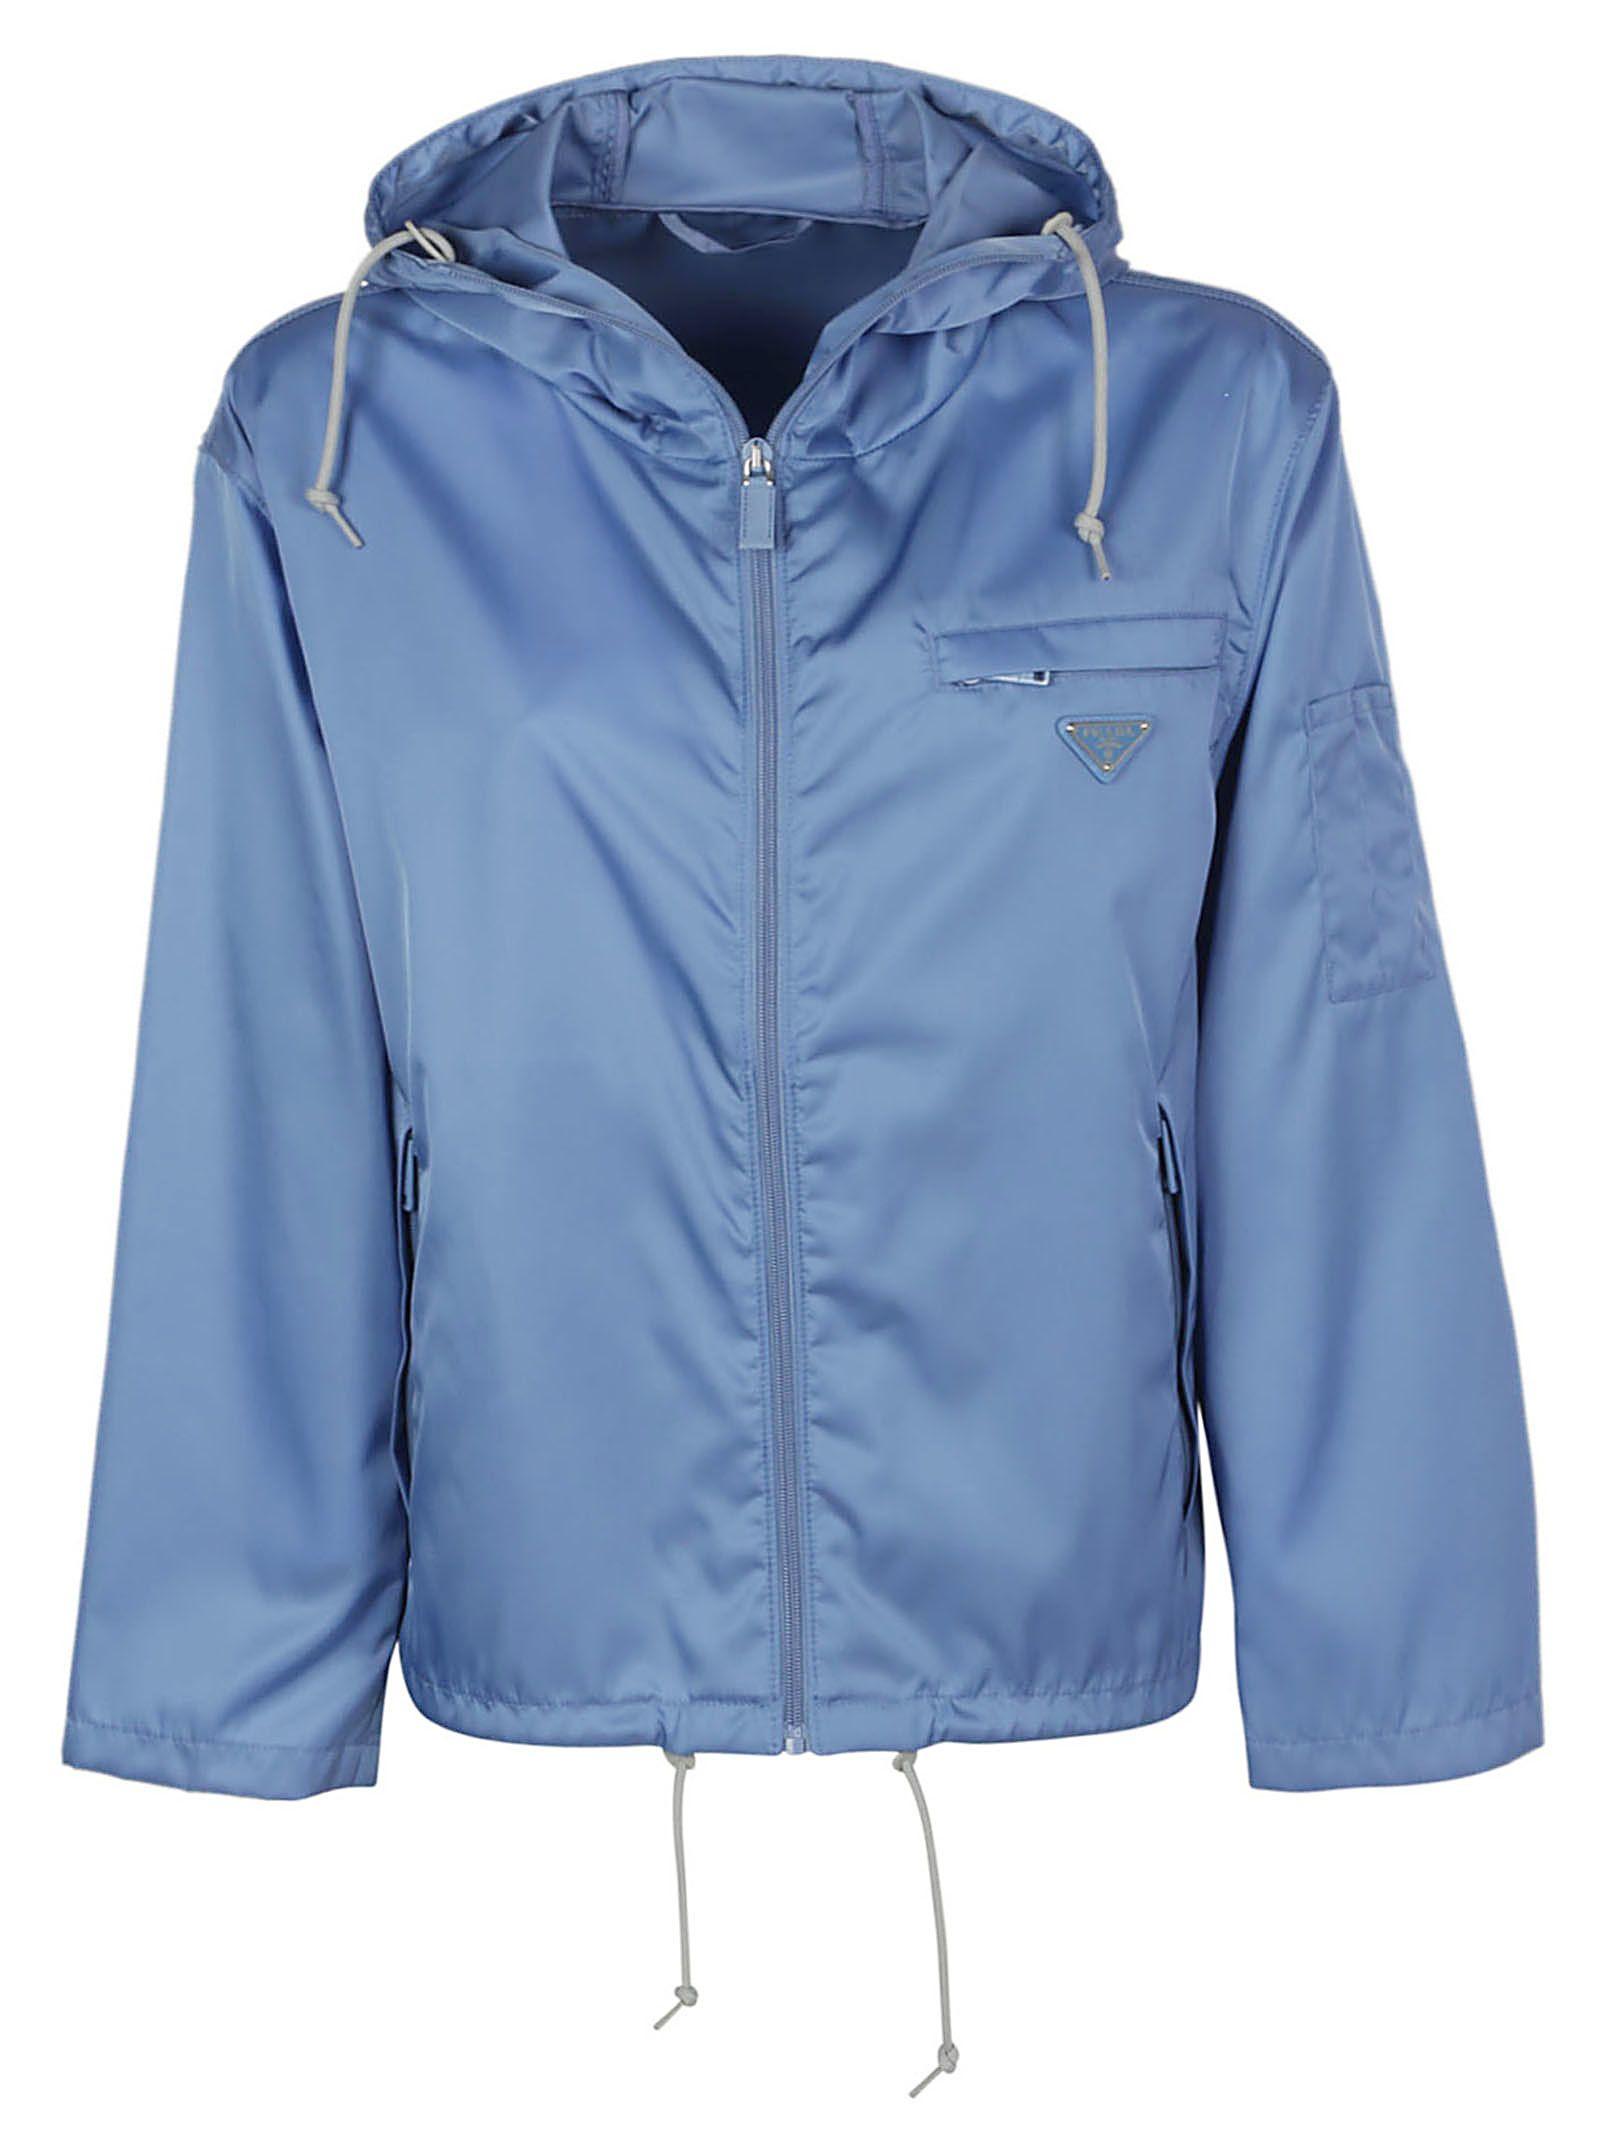 Prada K-way Jacket